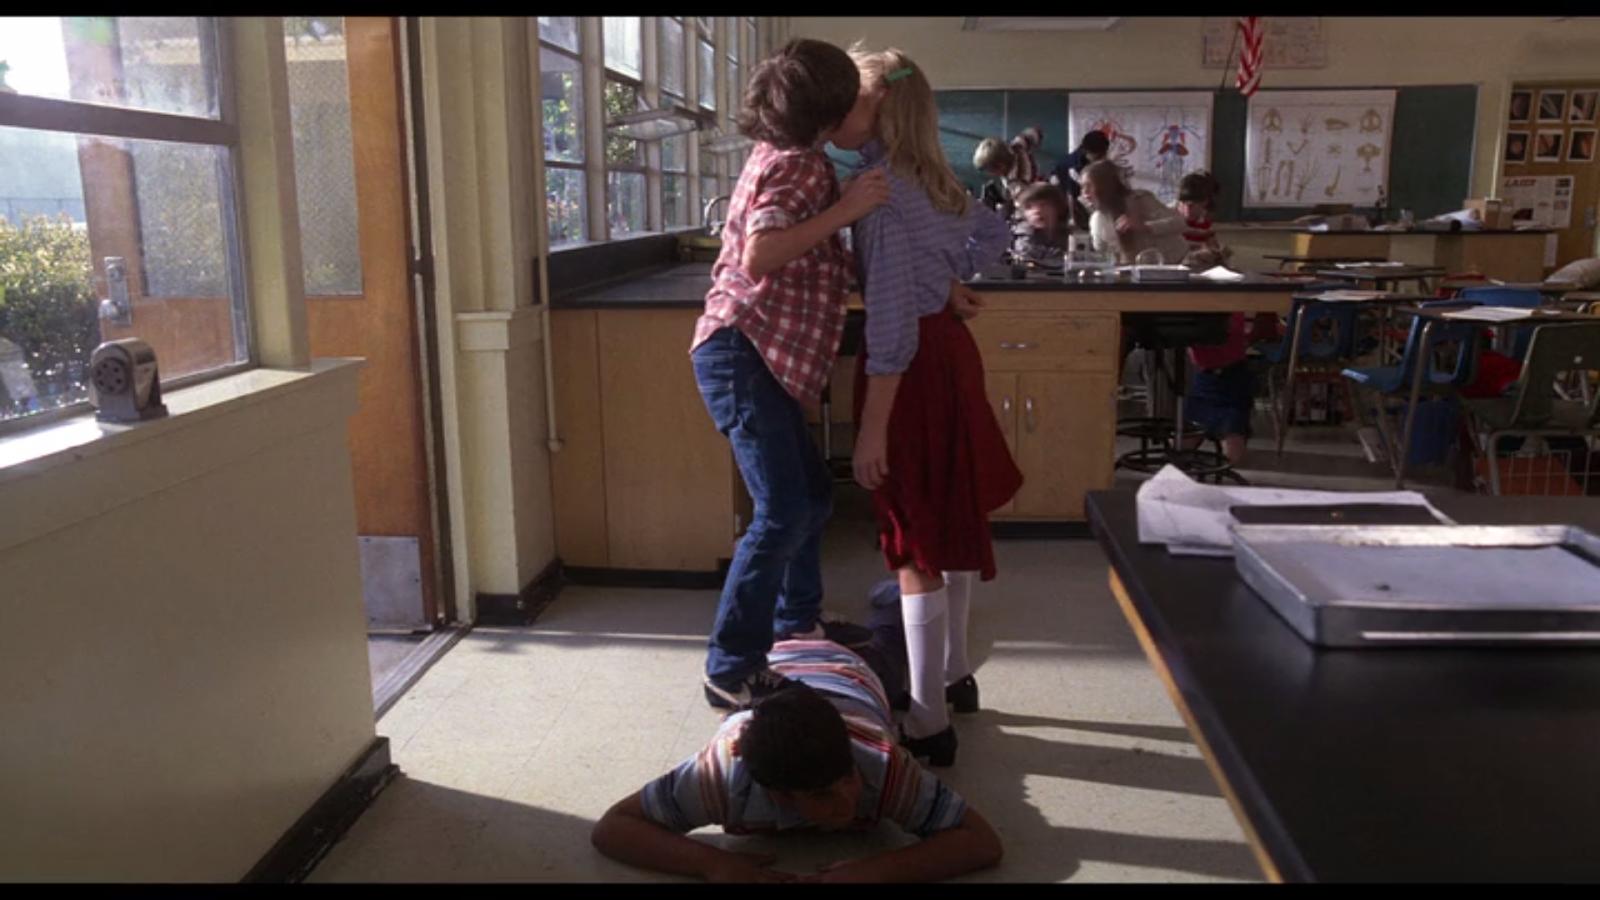 Elliot kisses a classmate